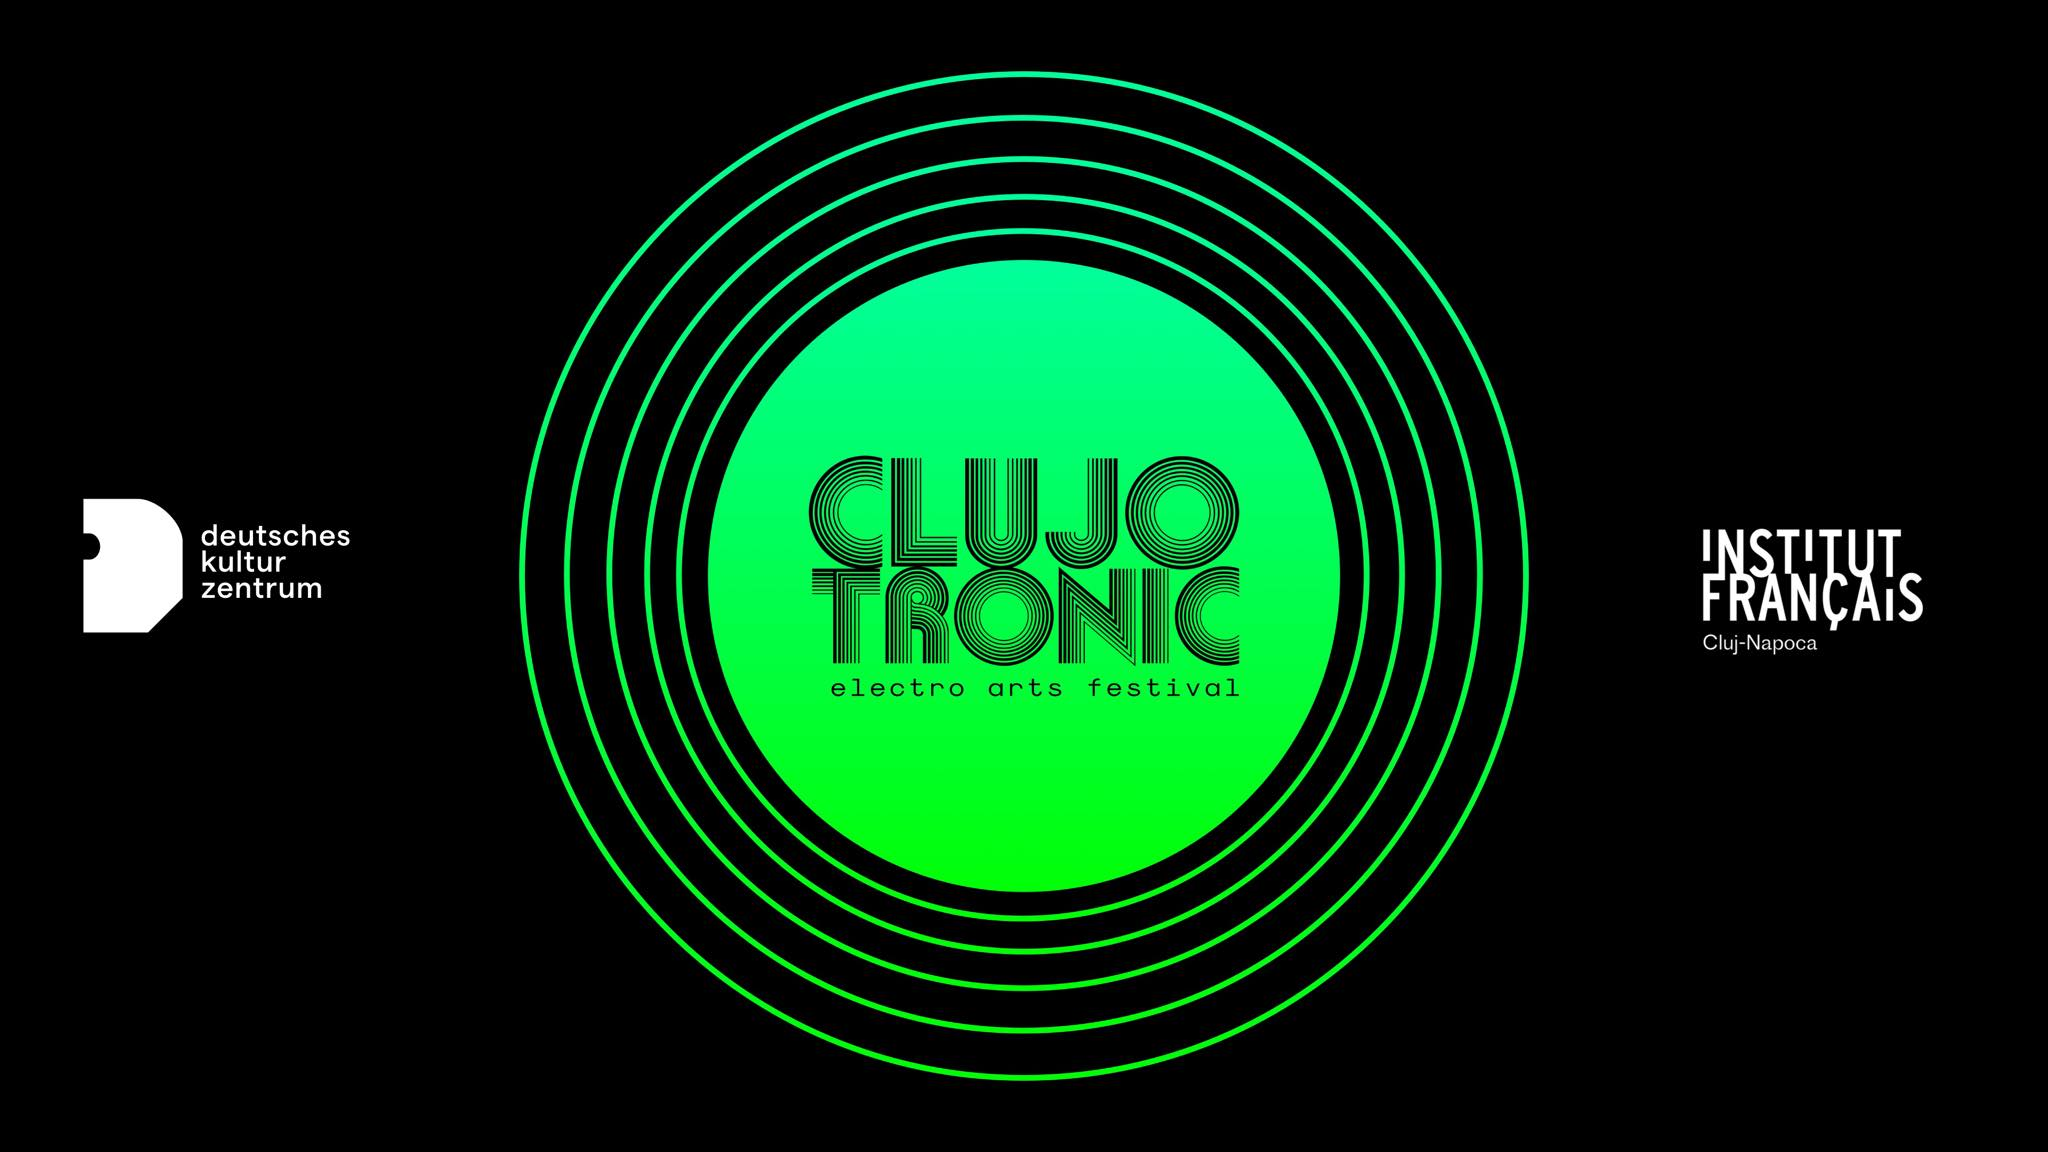 Clujotronic 2019 – Electro Arts Festival Public